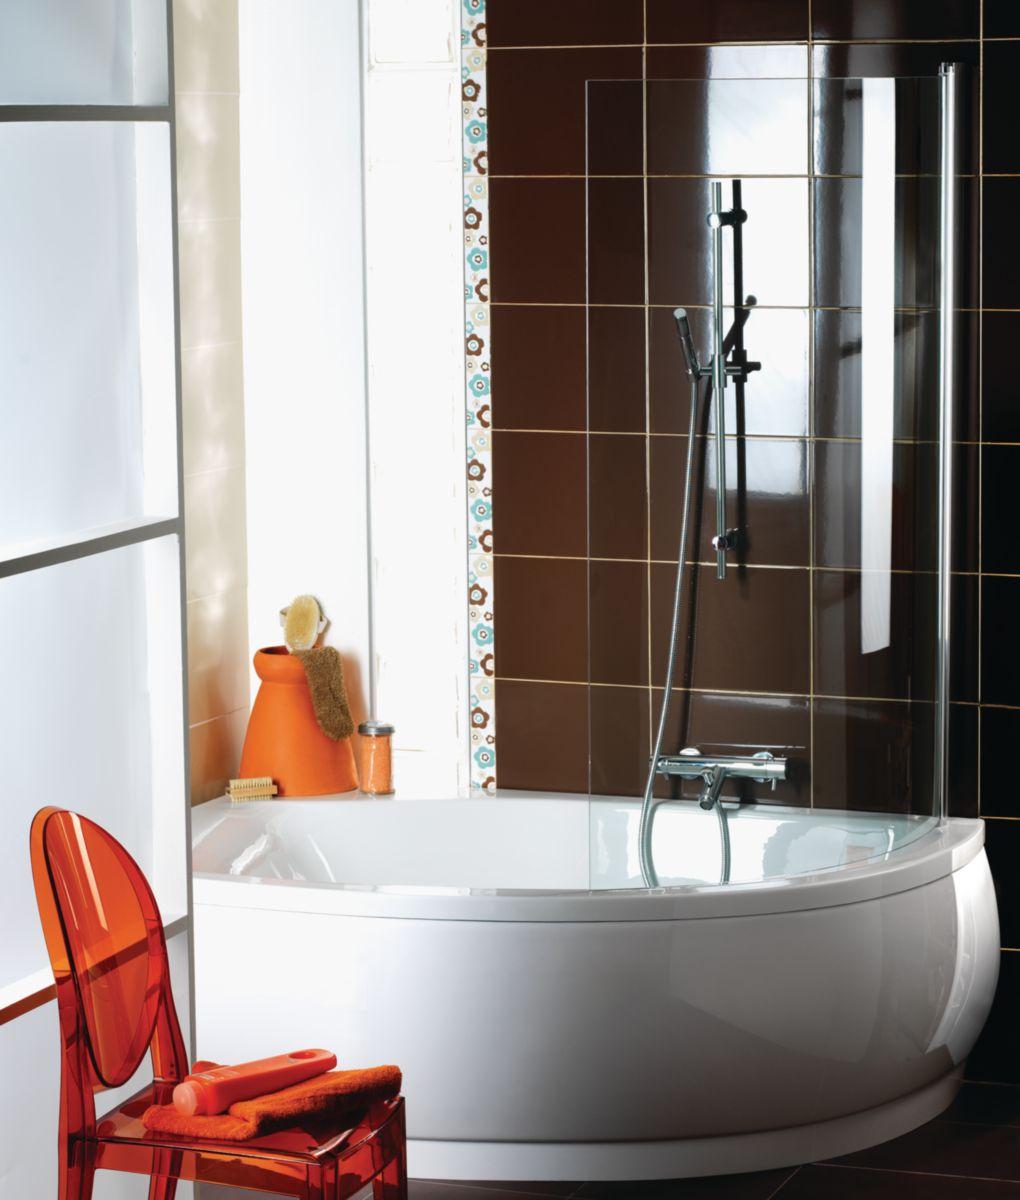 baignoire concerto 2 good aquabel optimum baignoire. Black Bedroom Furniture Sets. Home Design Ideas